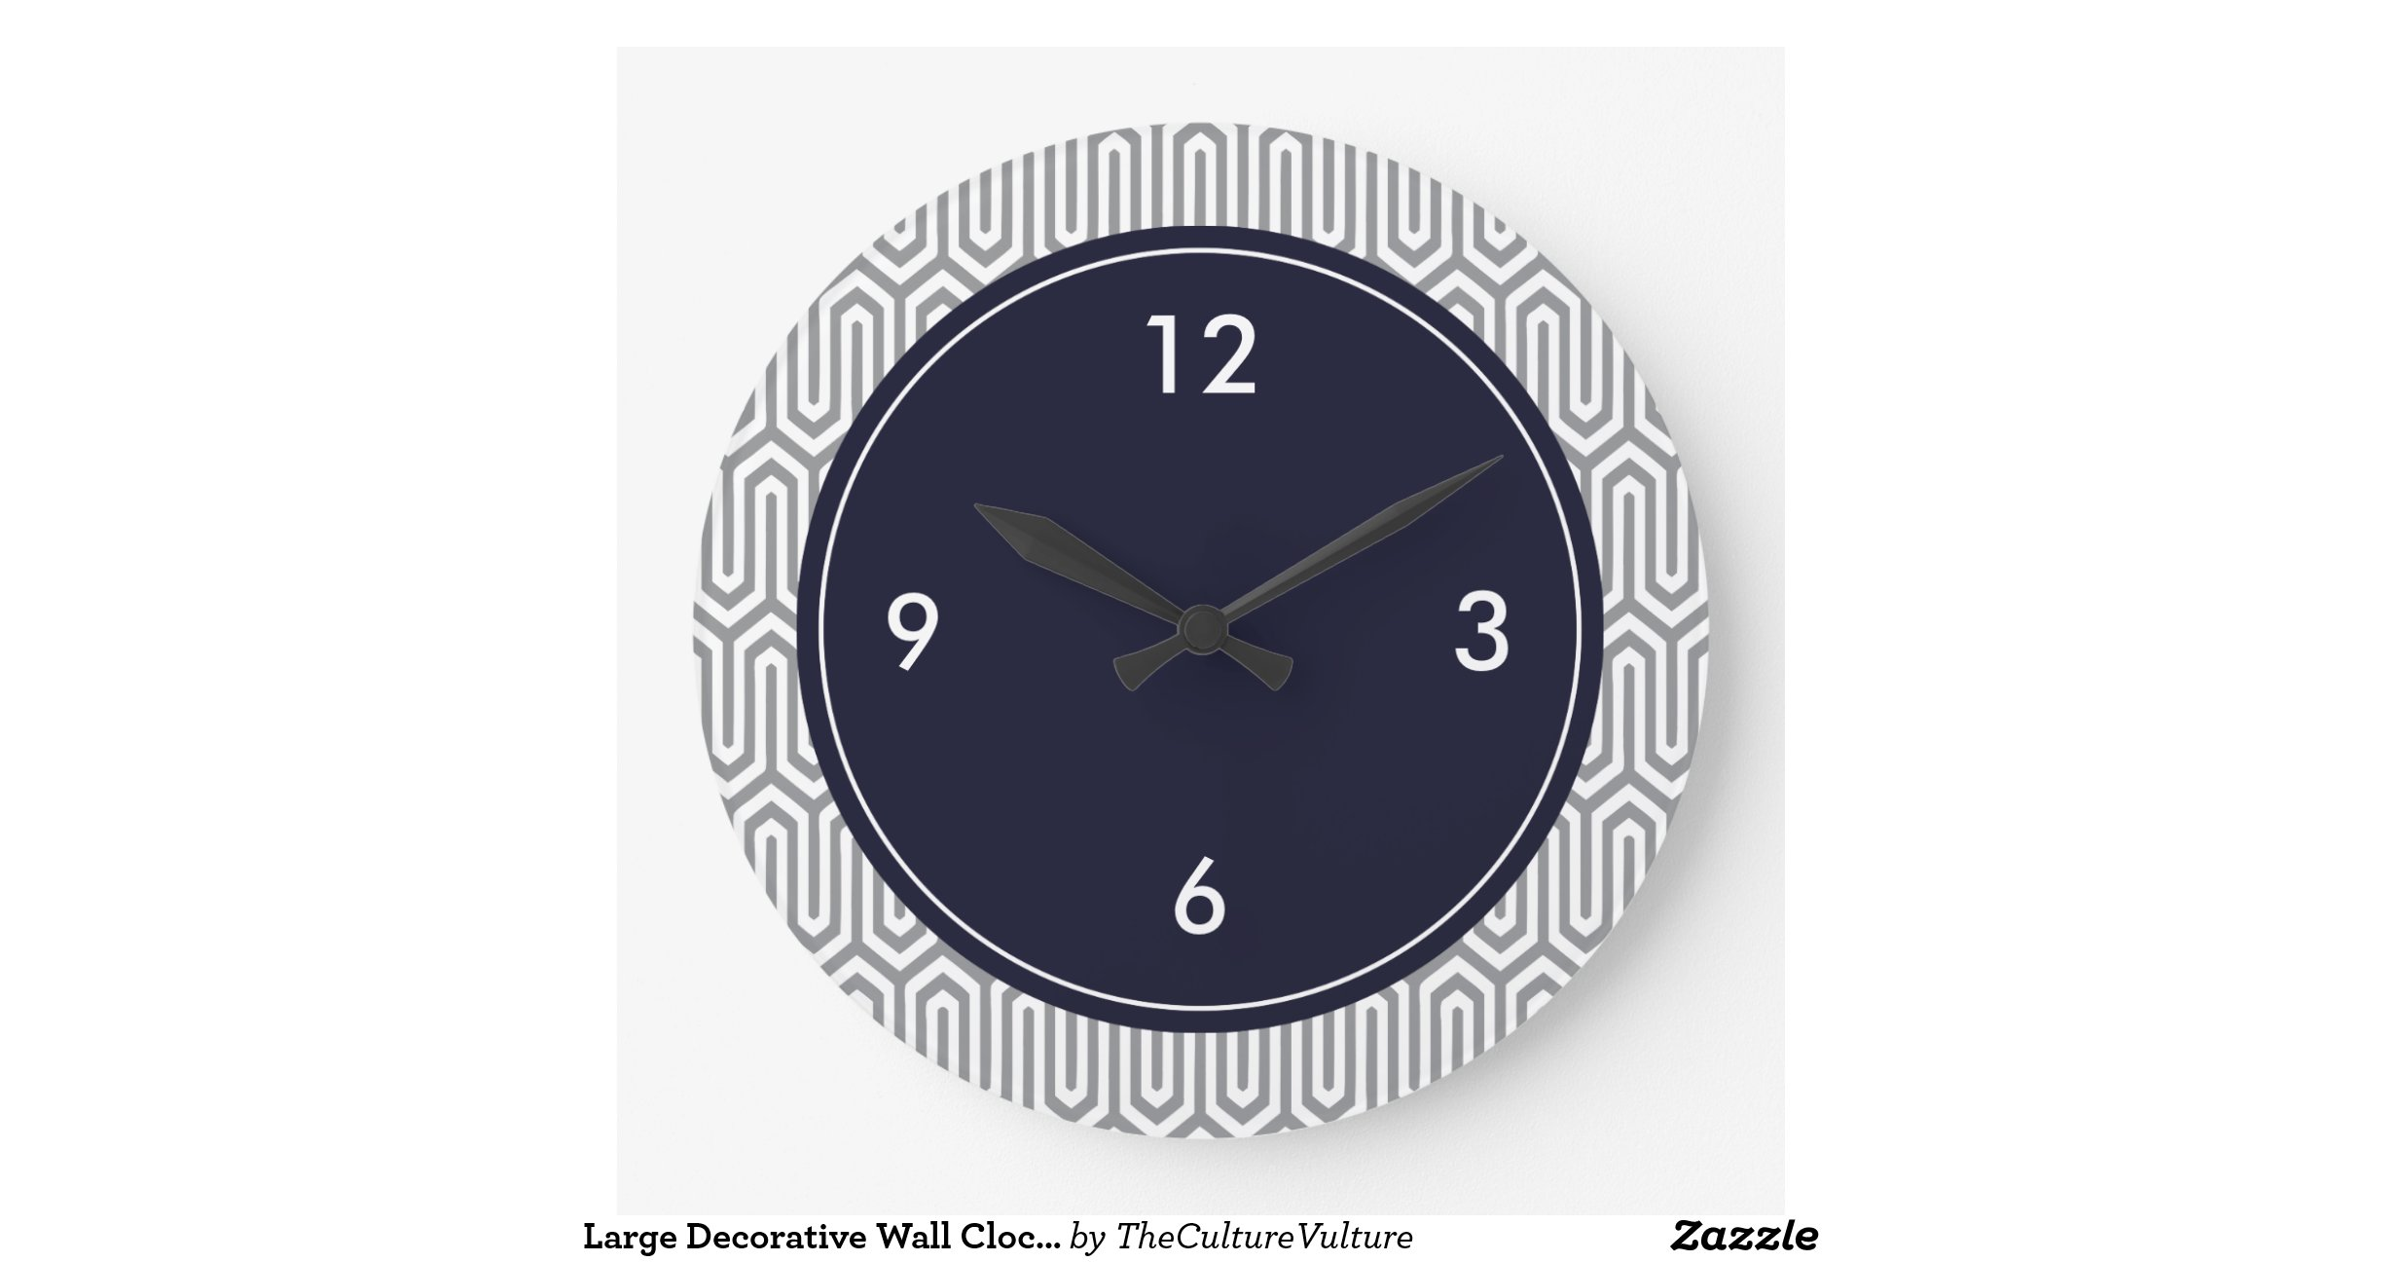 Large Decorative Wall Clock Abstract Pattern Raf3ad3be40dd41f6bc31730e60daf02